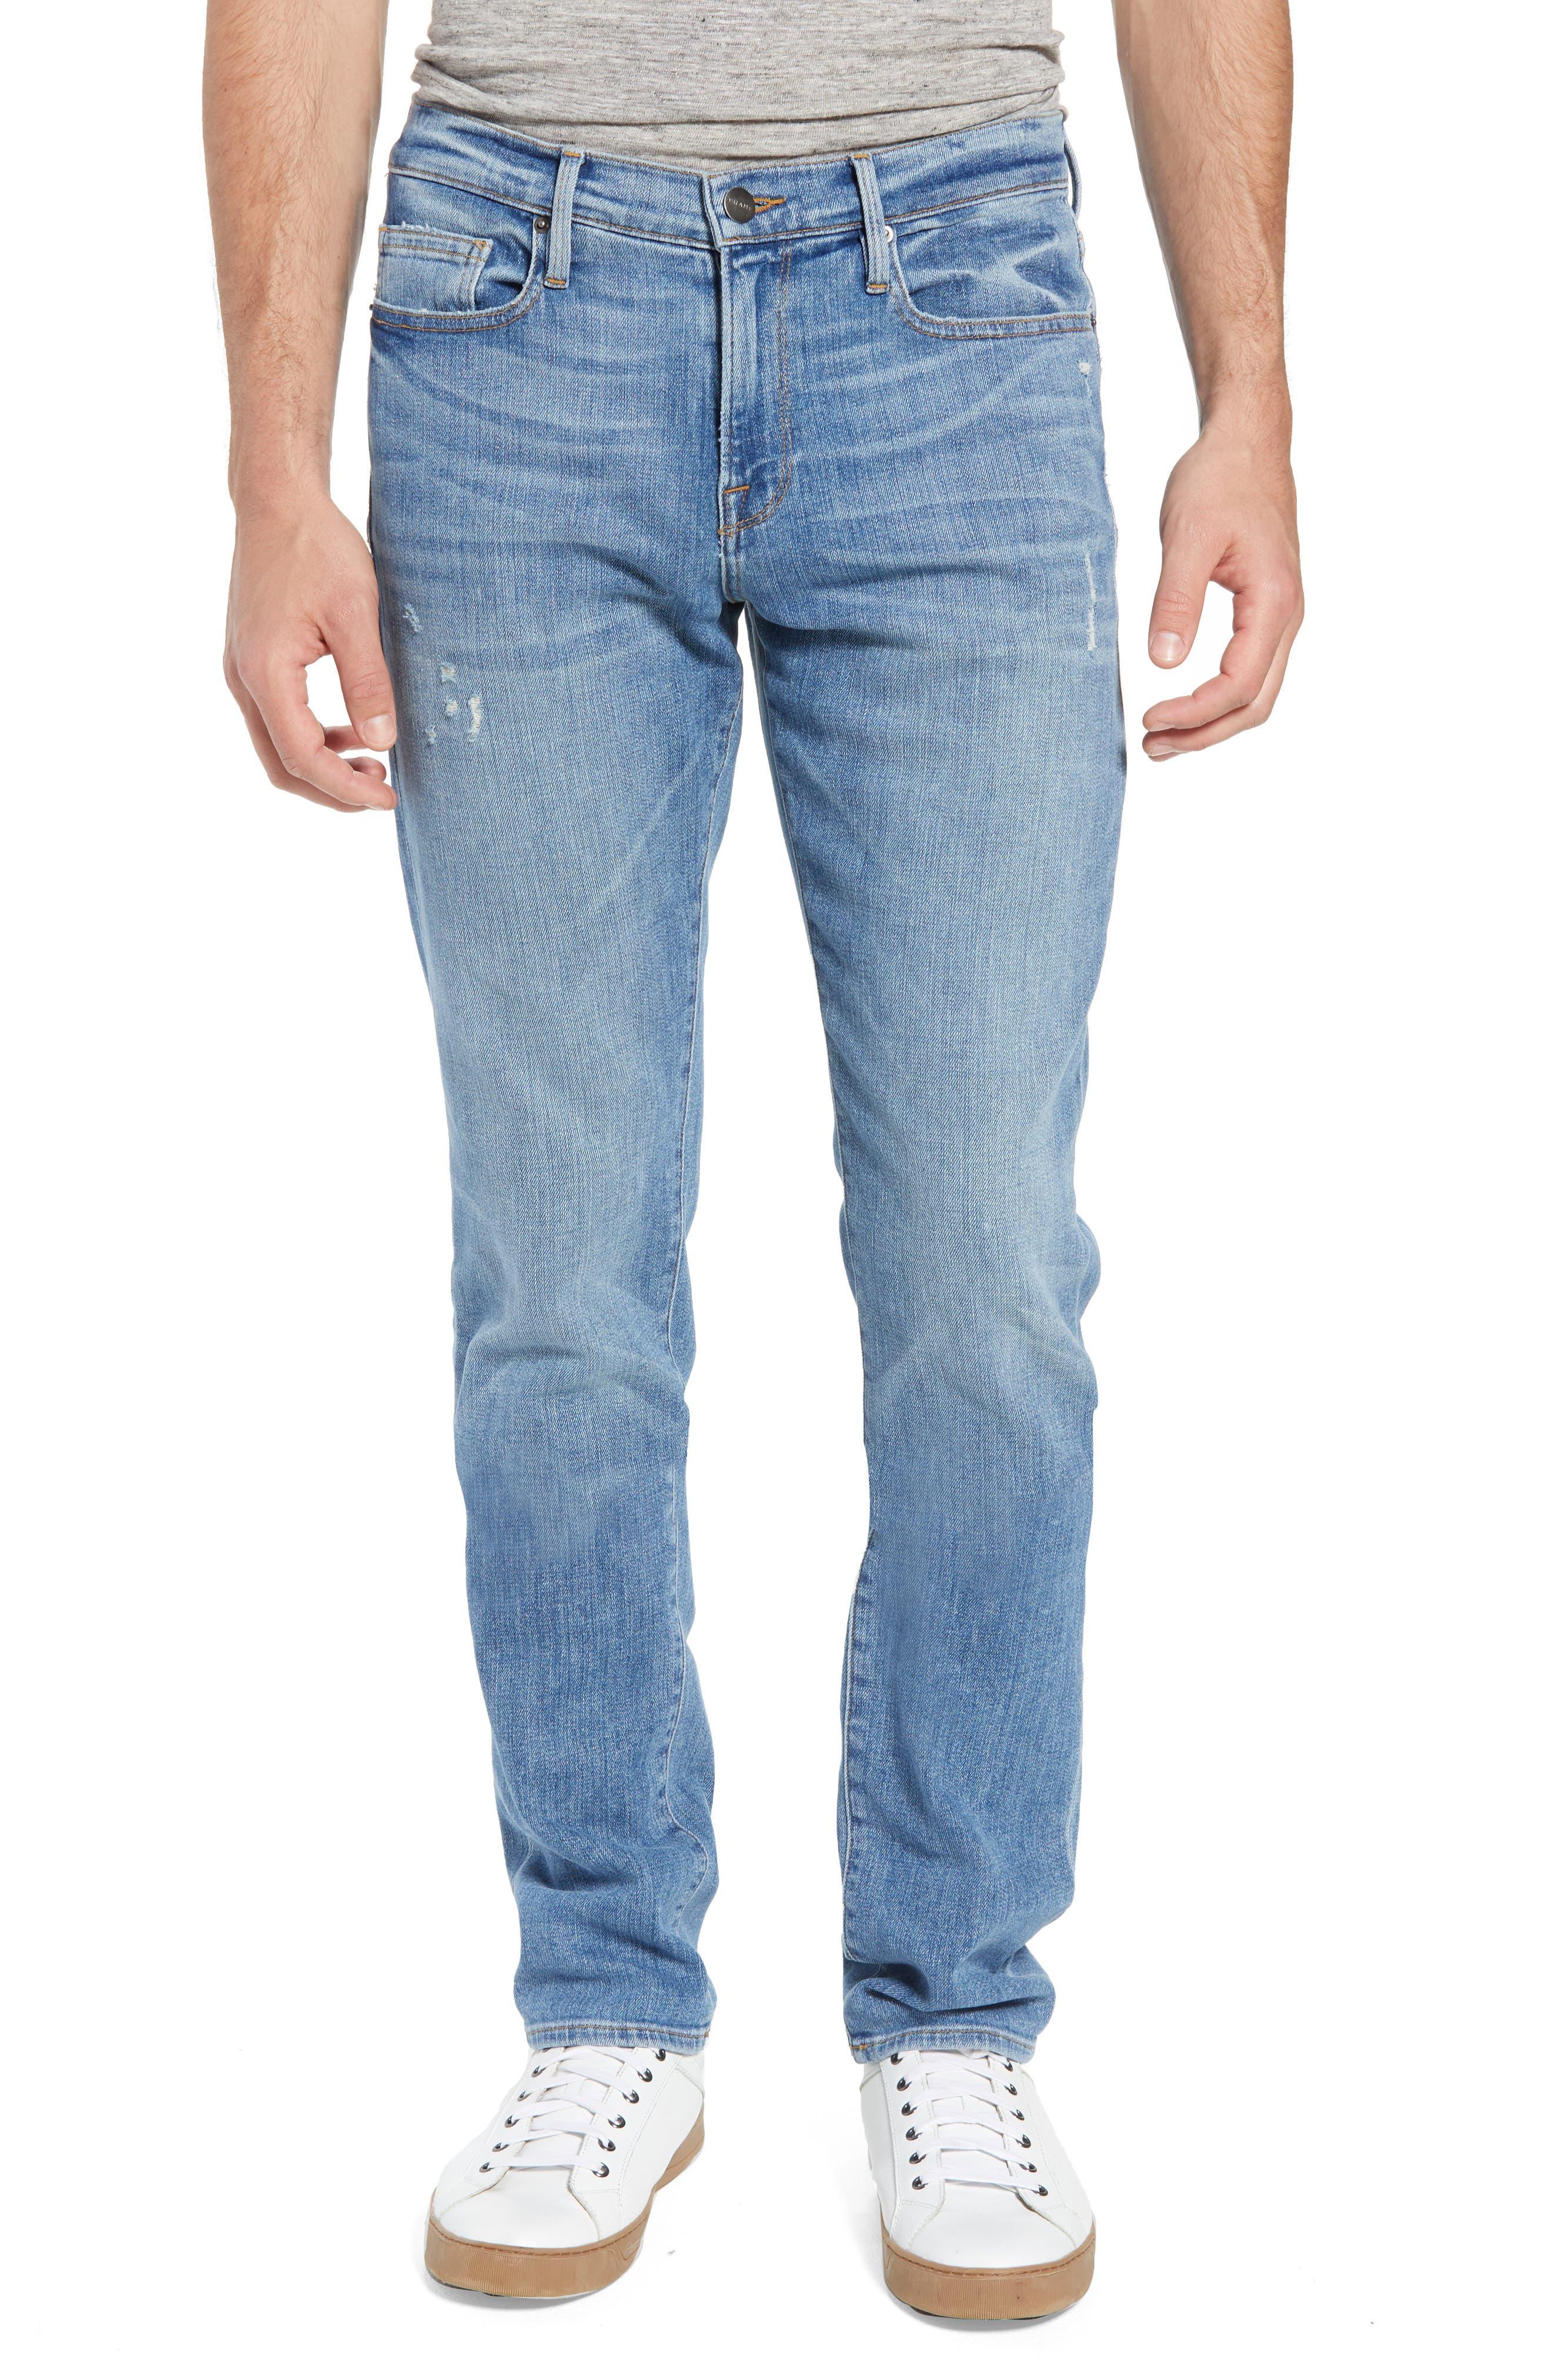 L'Homme Slim Straight Fit Jeans,                             Main thumbnail 1, color,                             Russel Cave